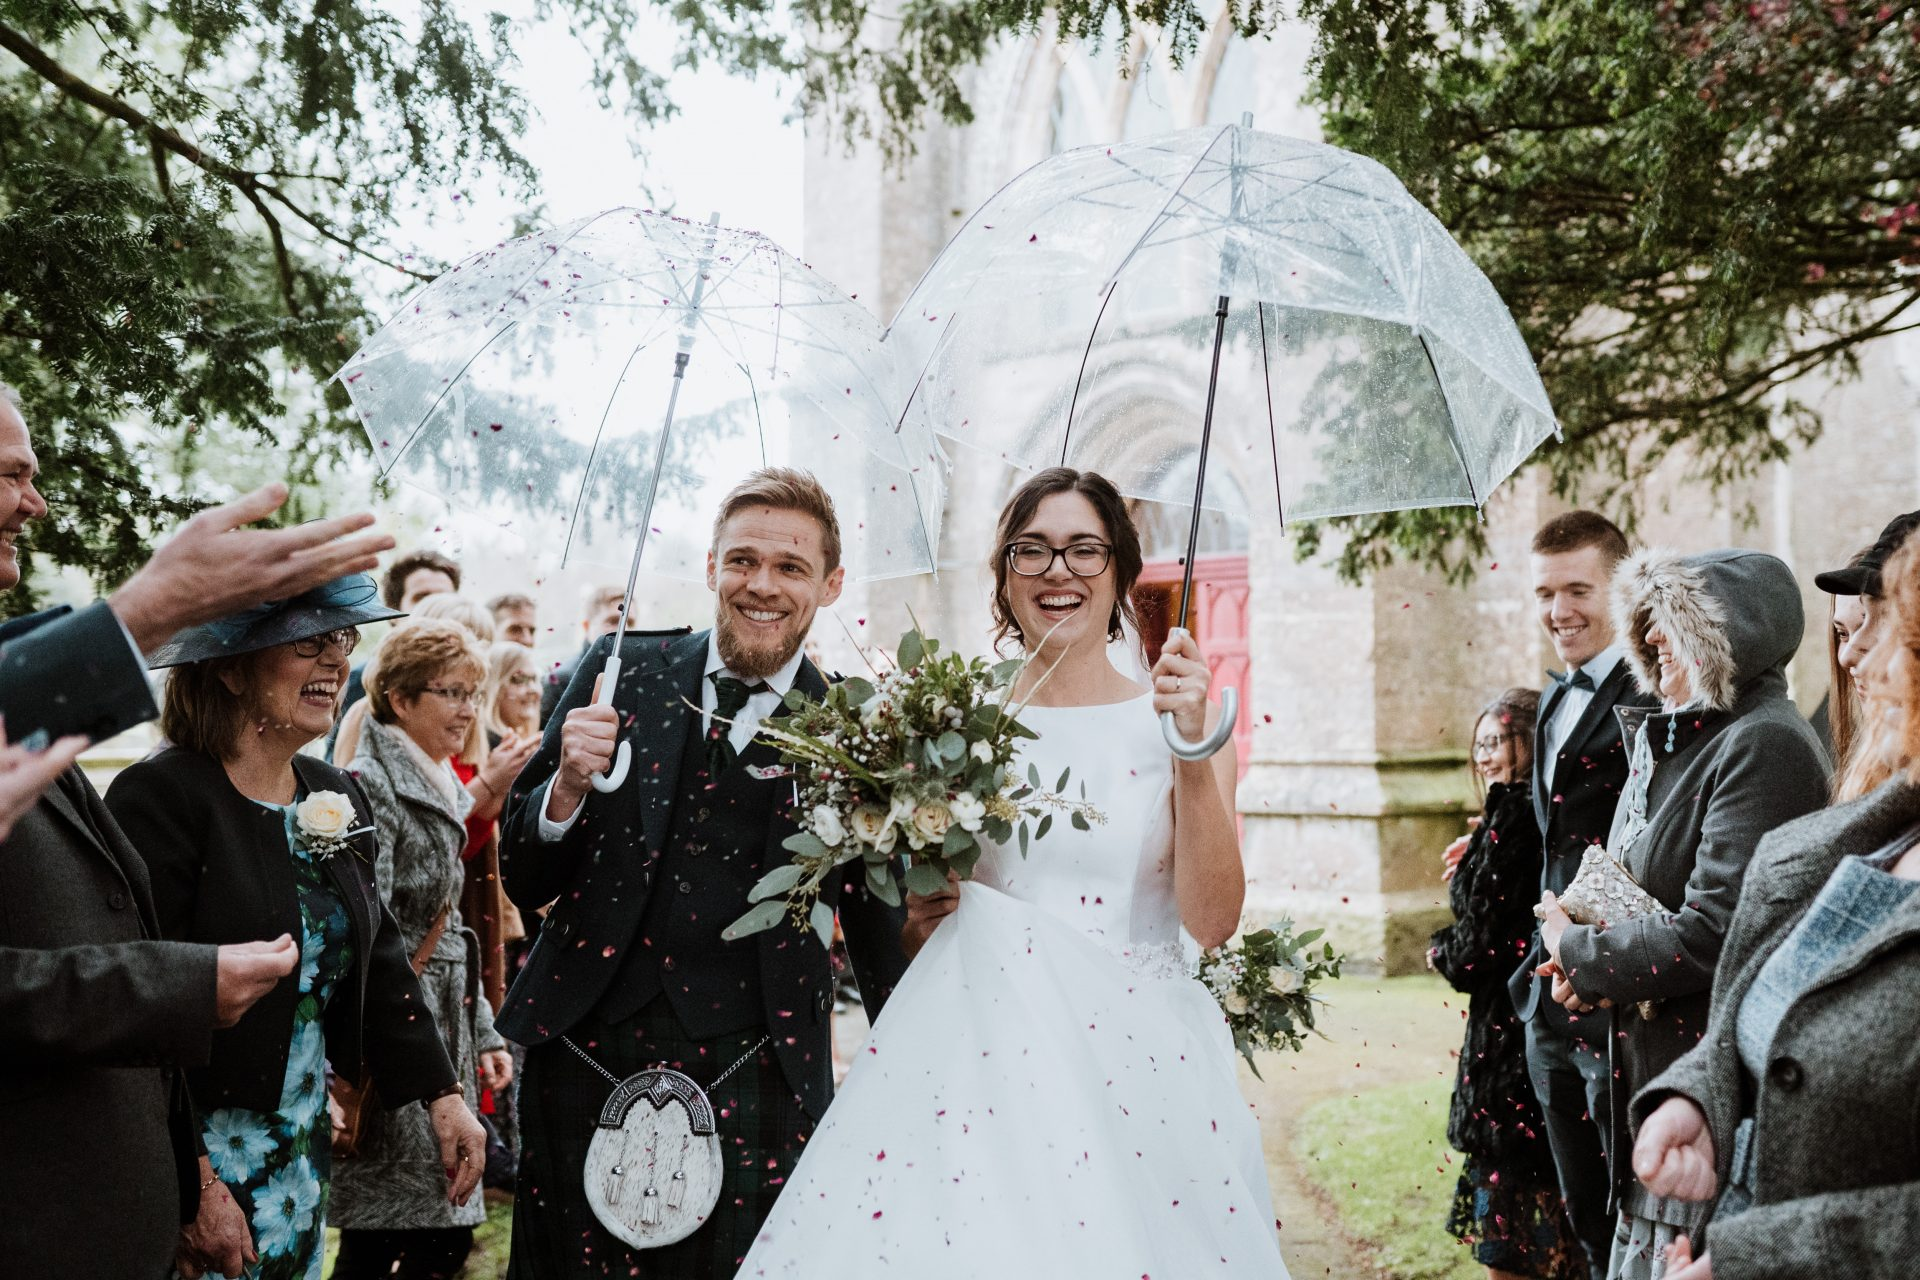 bride and groom walk through the confetti tunnel under umbrellas